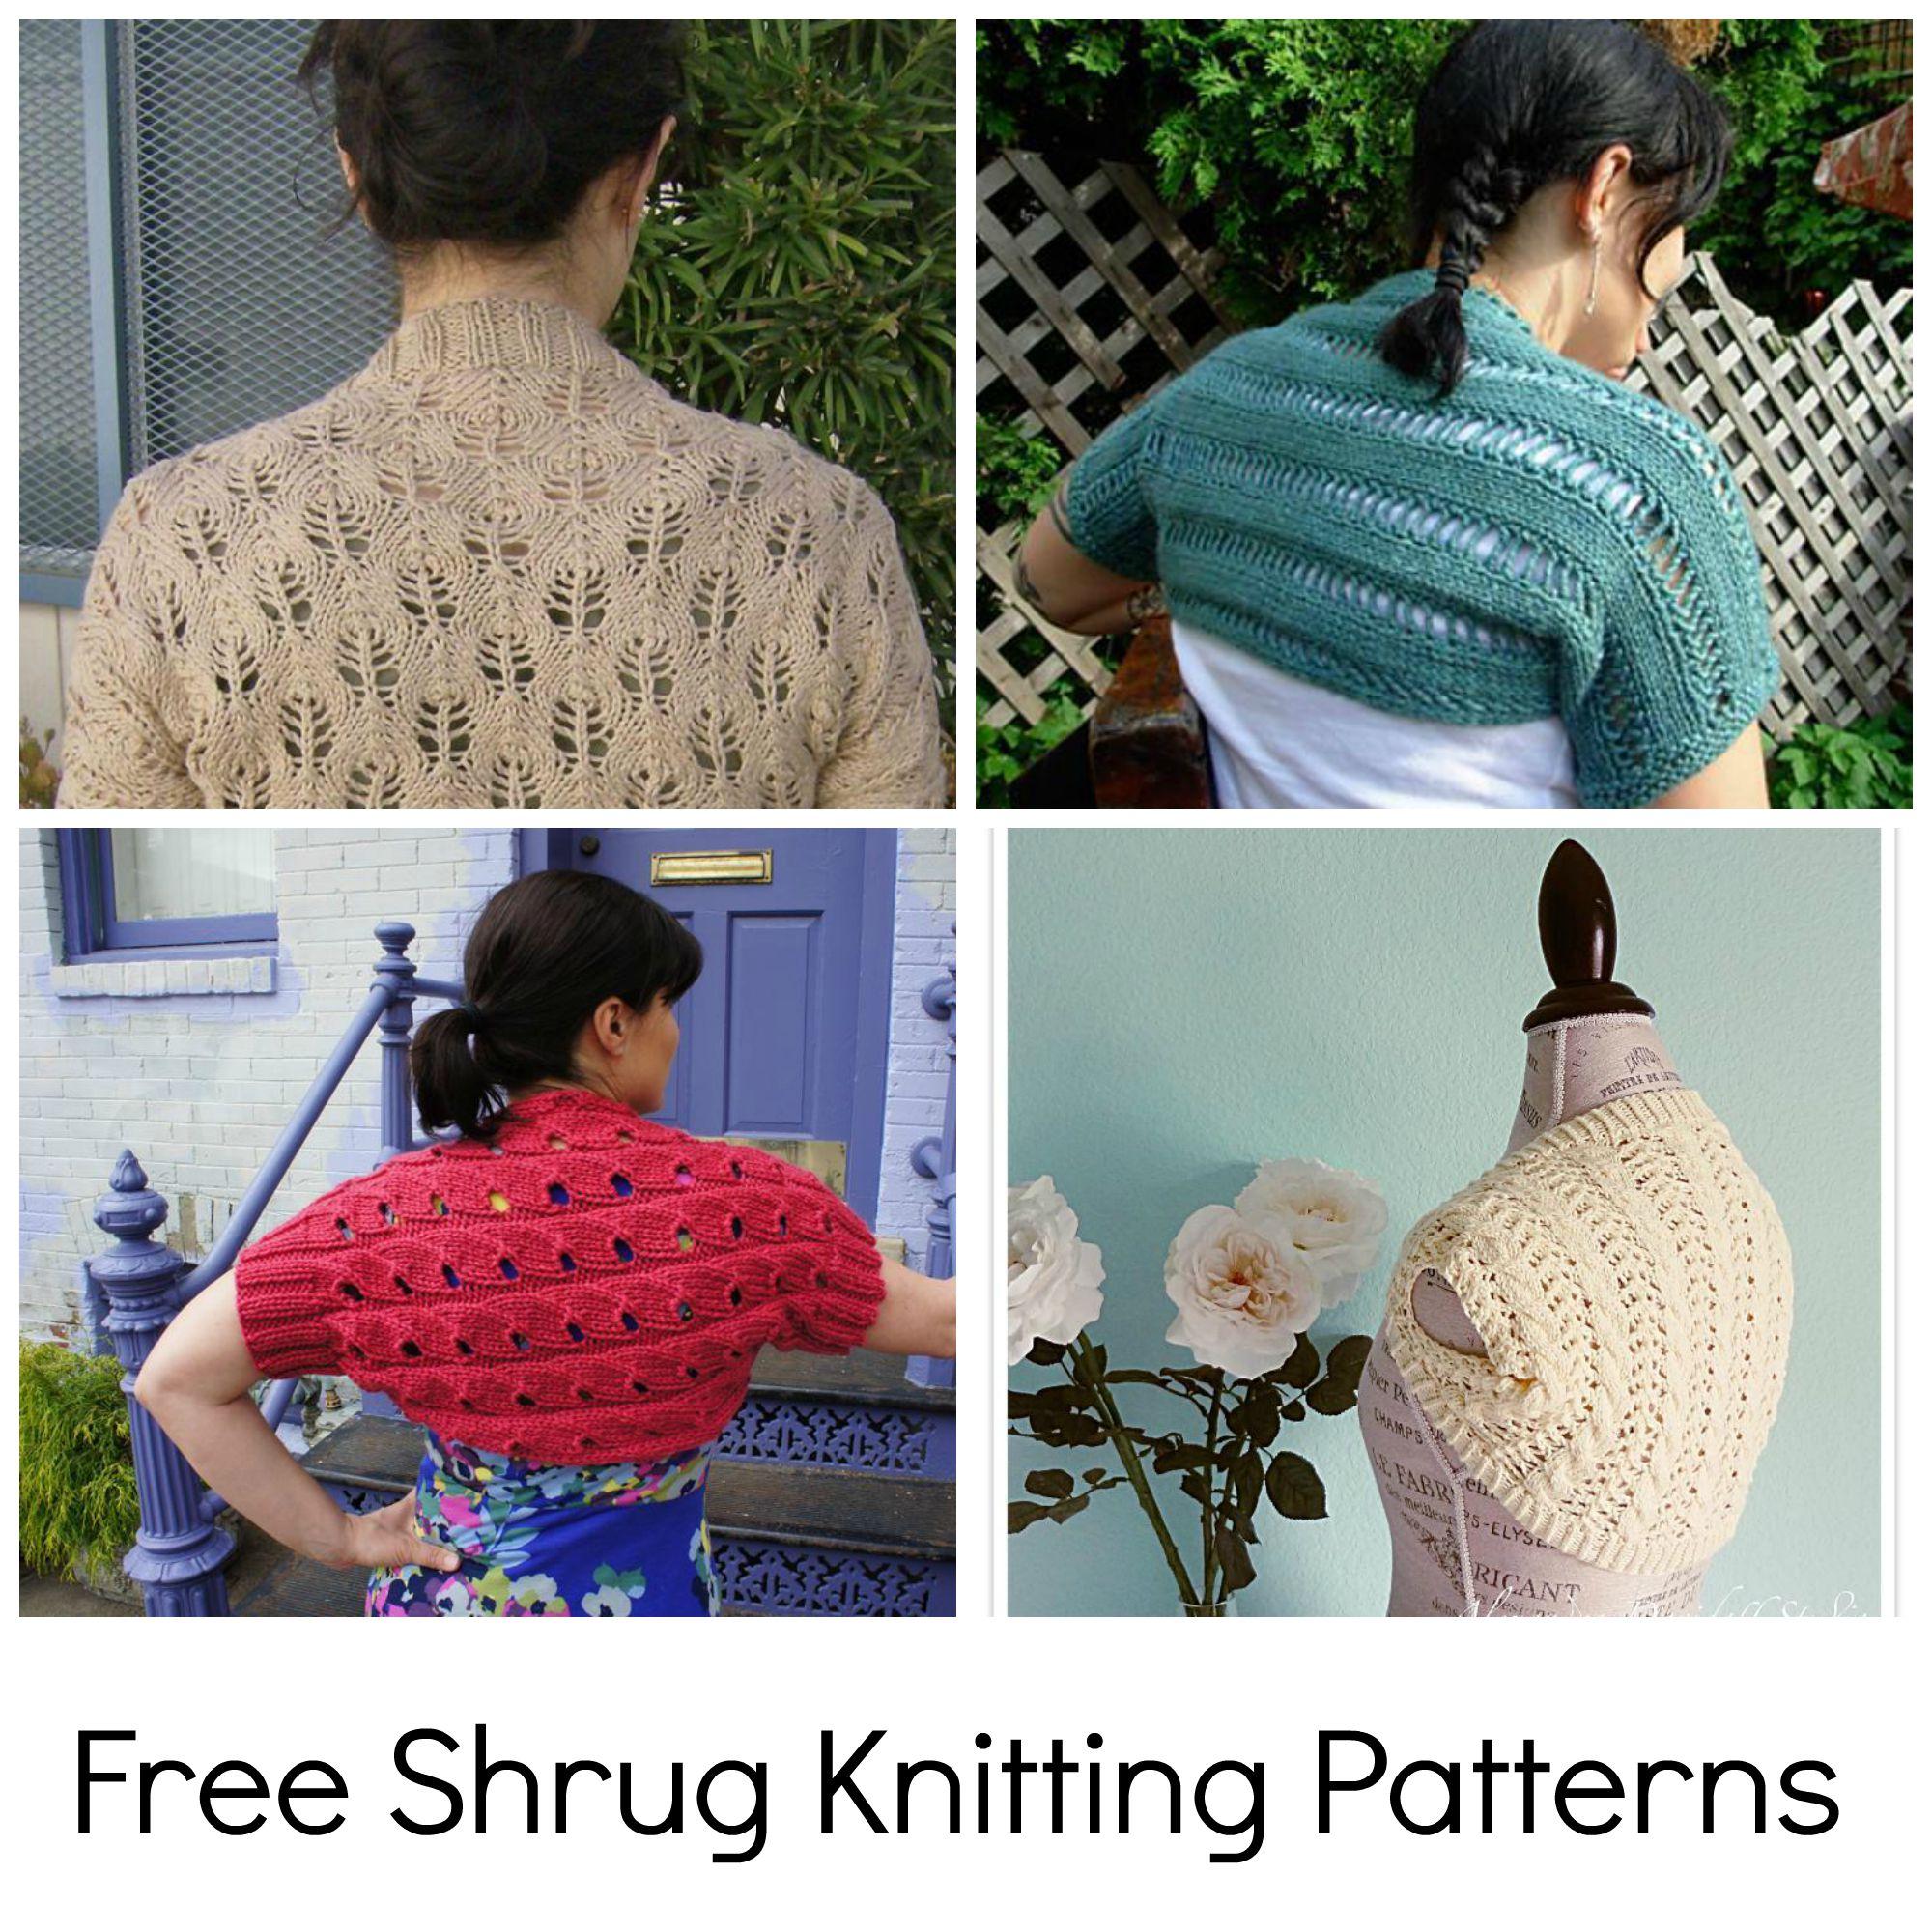 Free Shrug Knitting Patterns